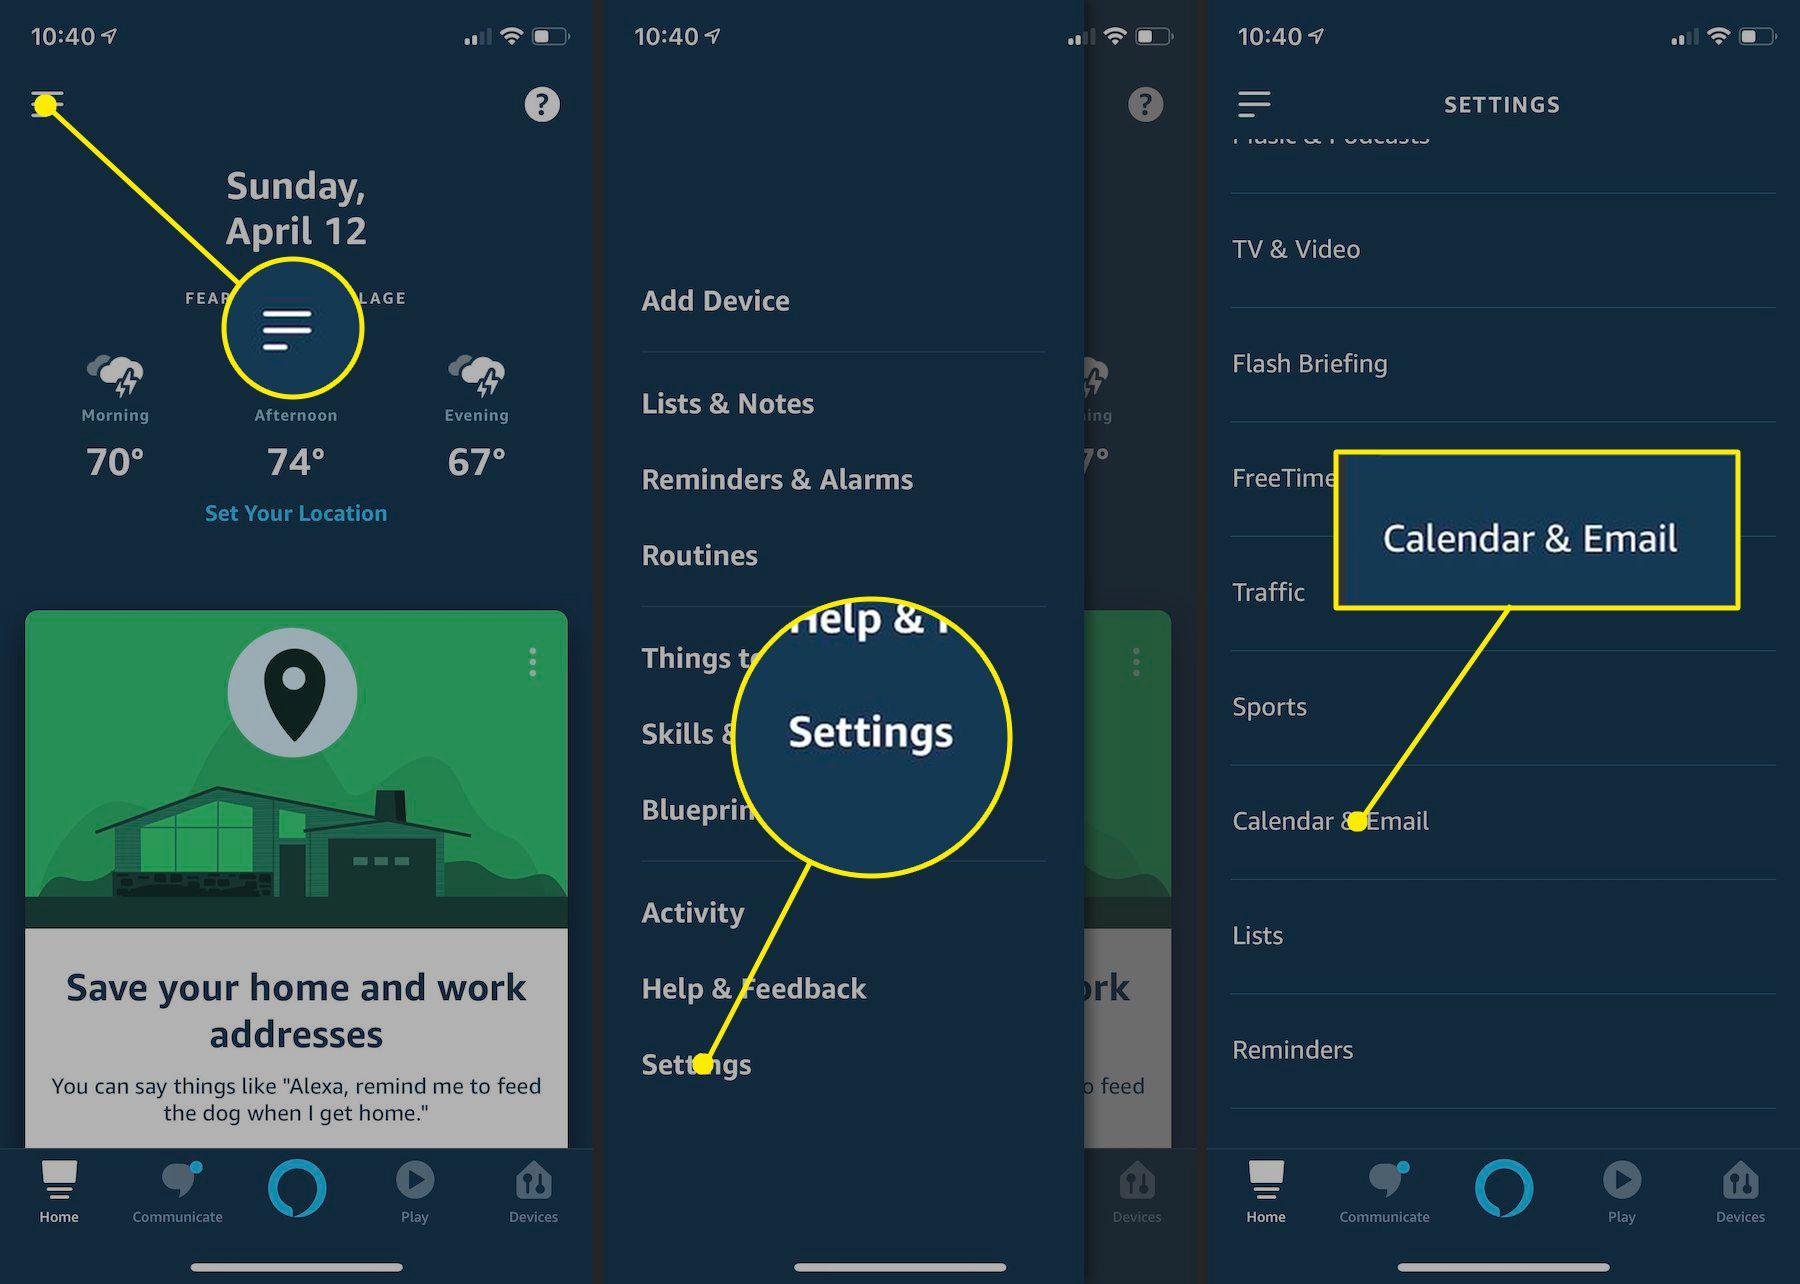 Locating Calendar settings in Alexa app on iPhone.